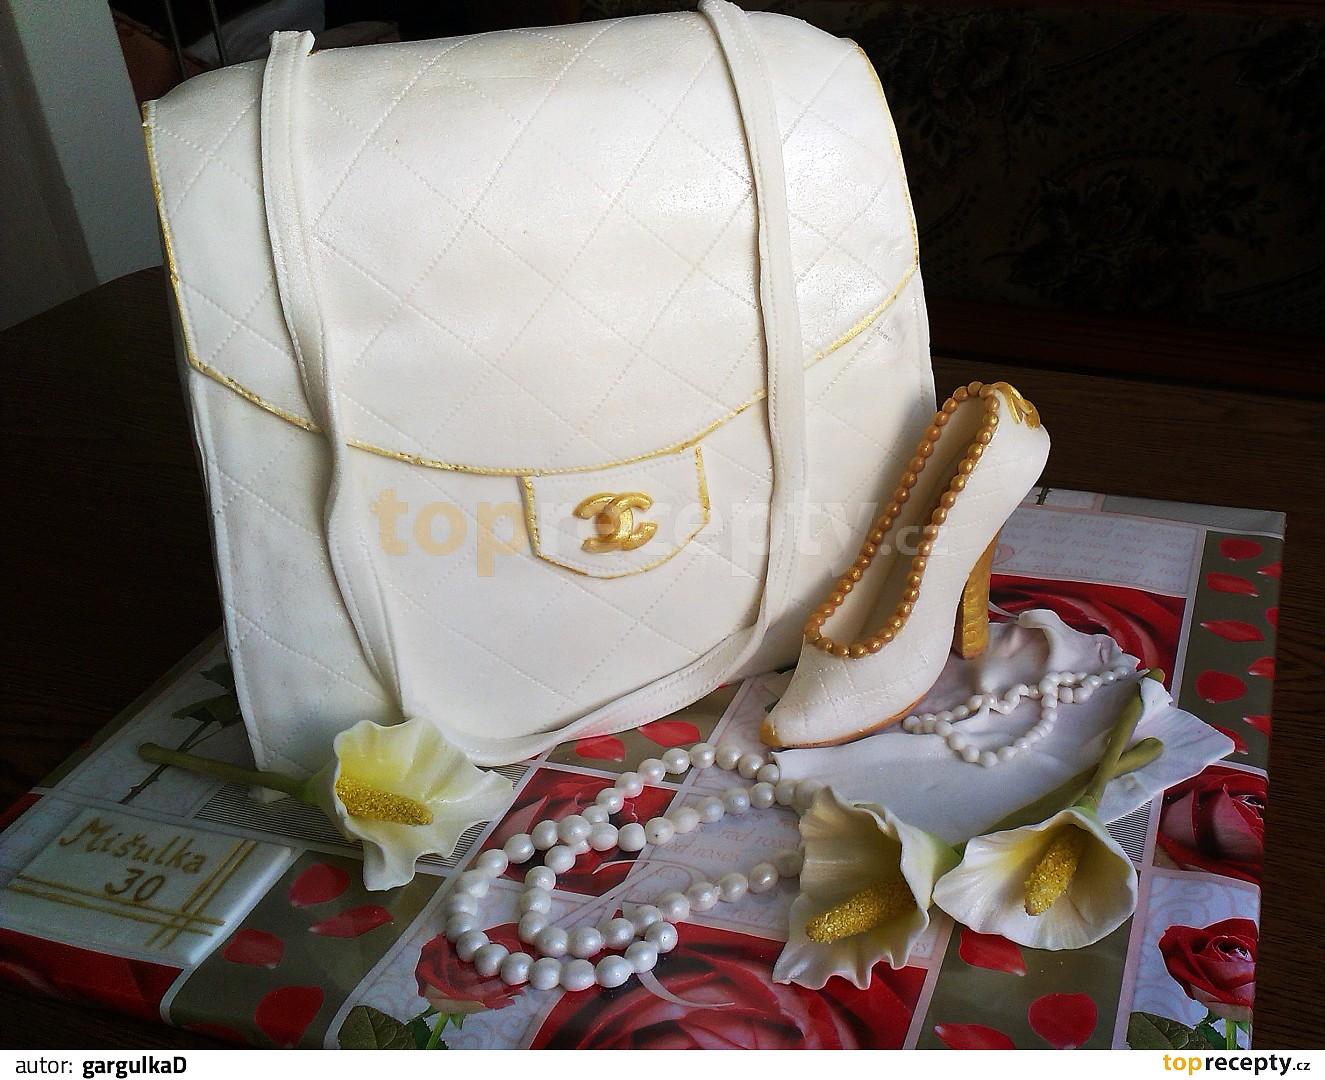 Coco Chanel kabelka recept - TopRecepty.cz 209753d83c2